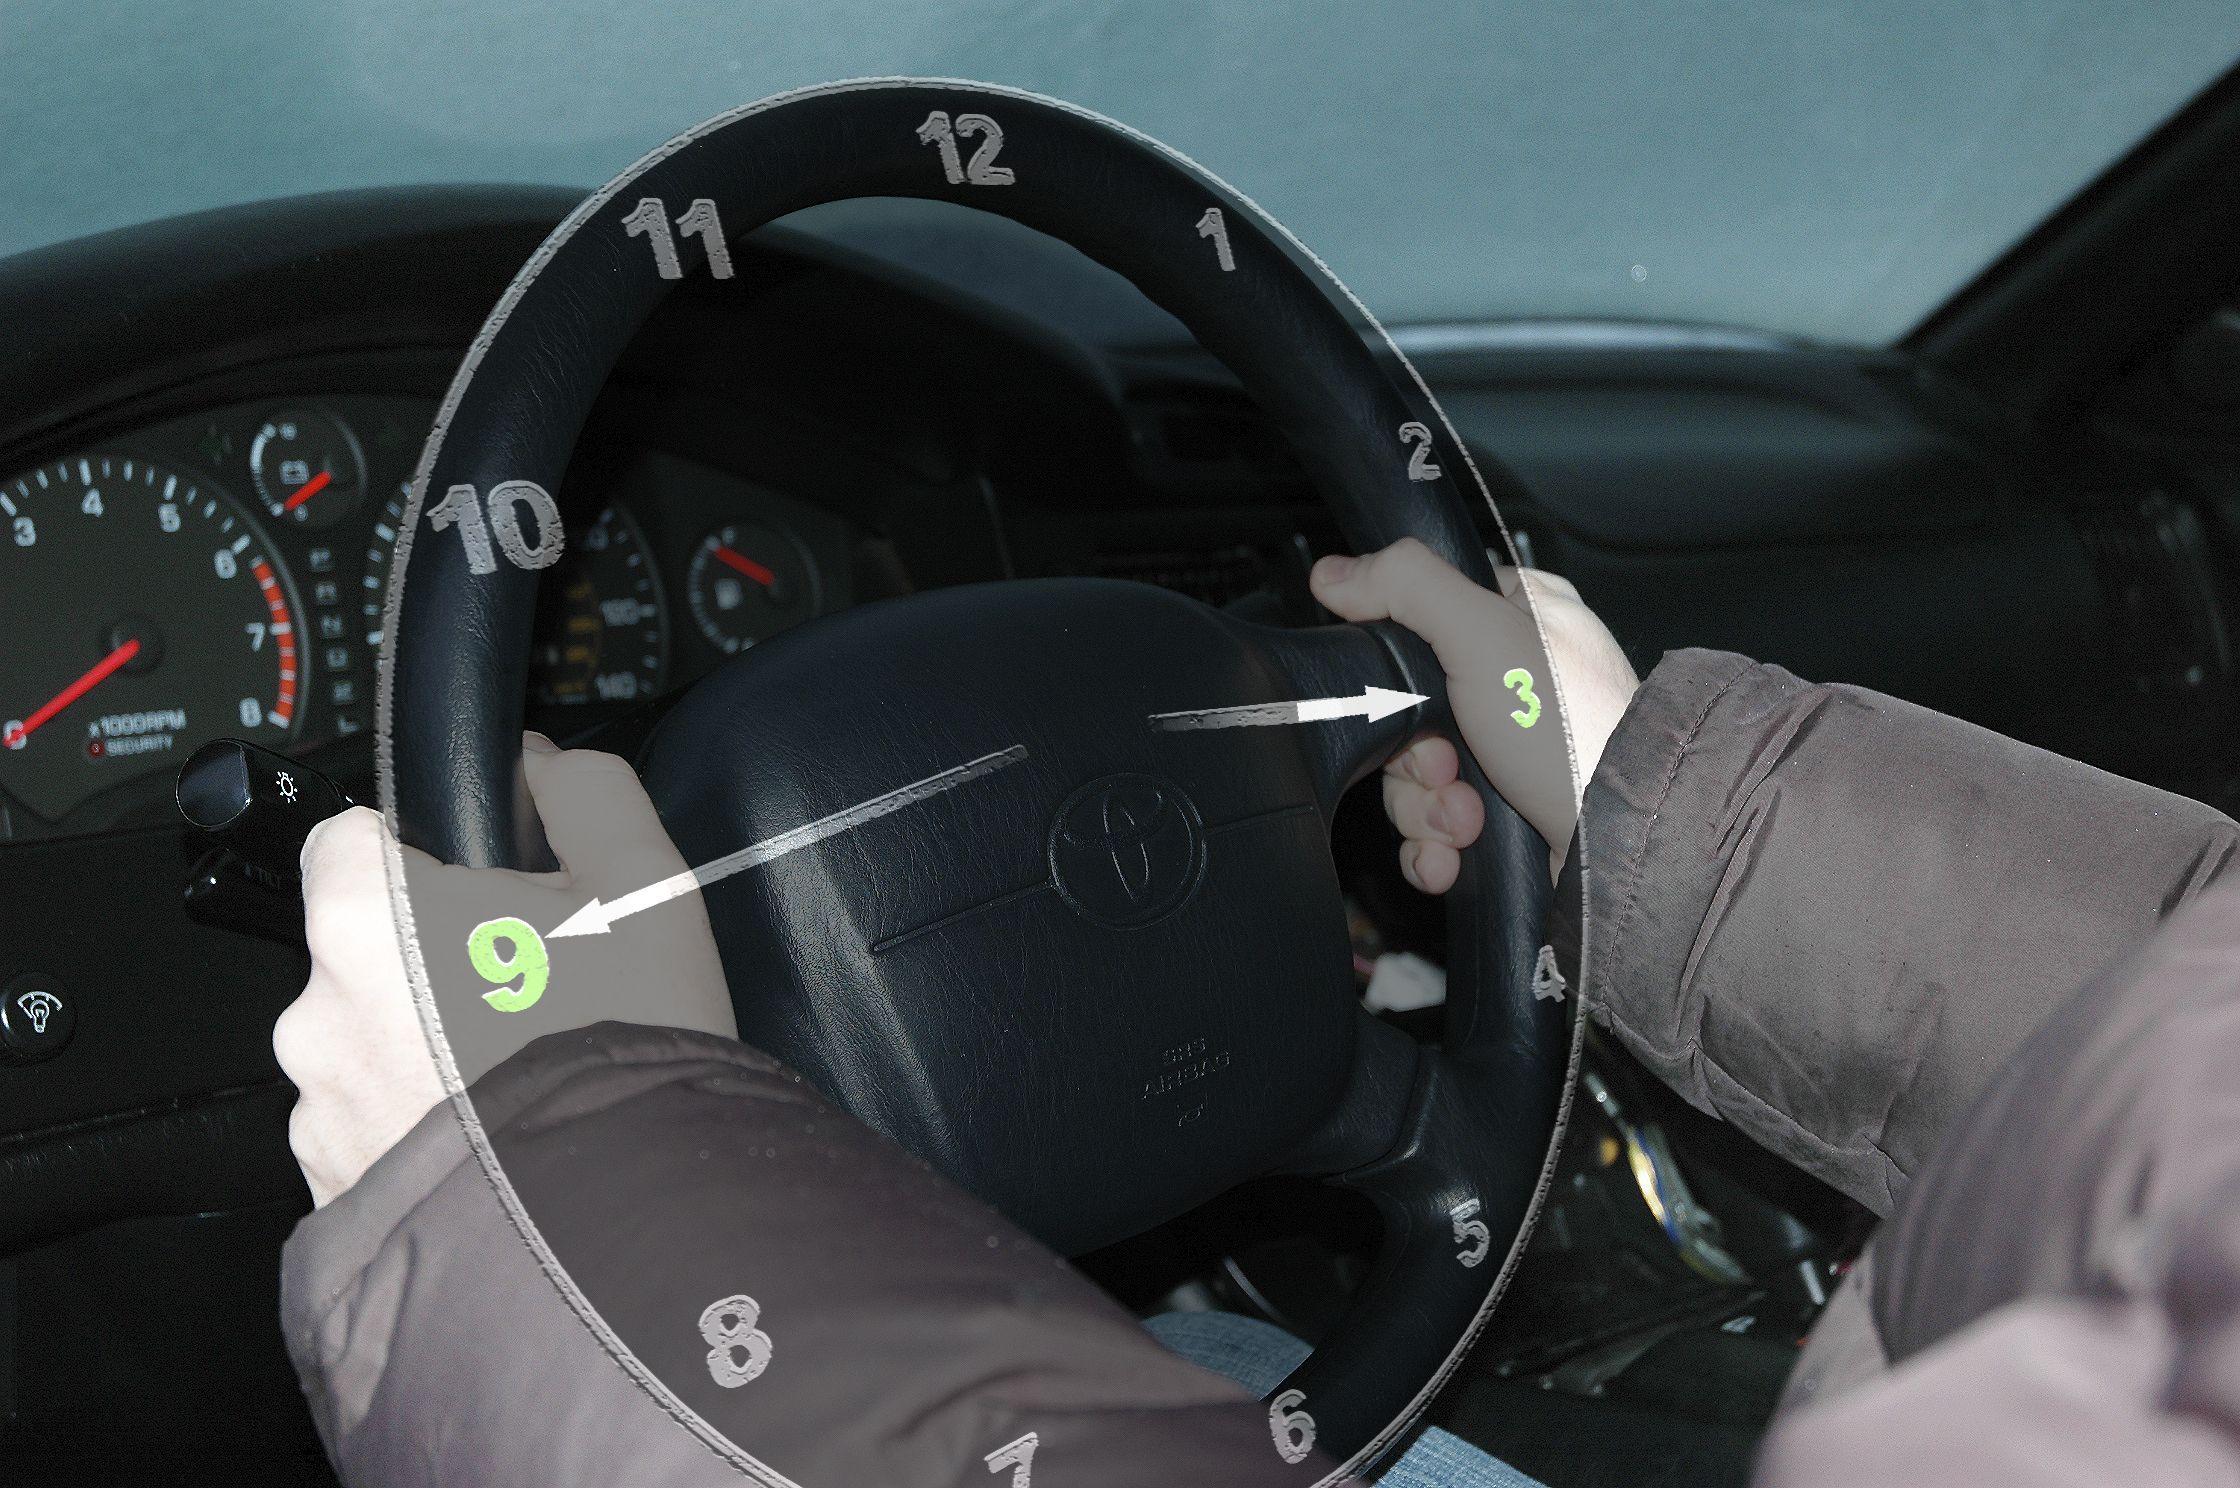 16+ Mesmerizing Alloy Wheels Colour Ideas Car wheels